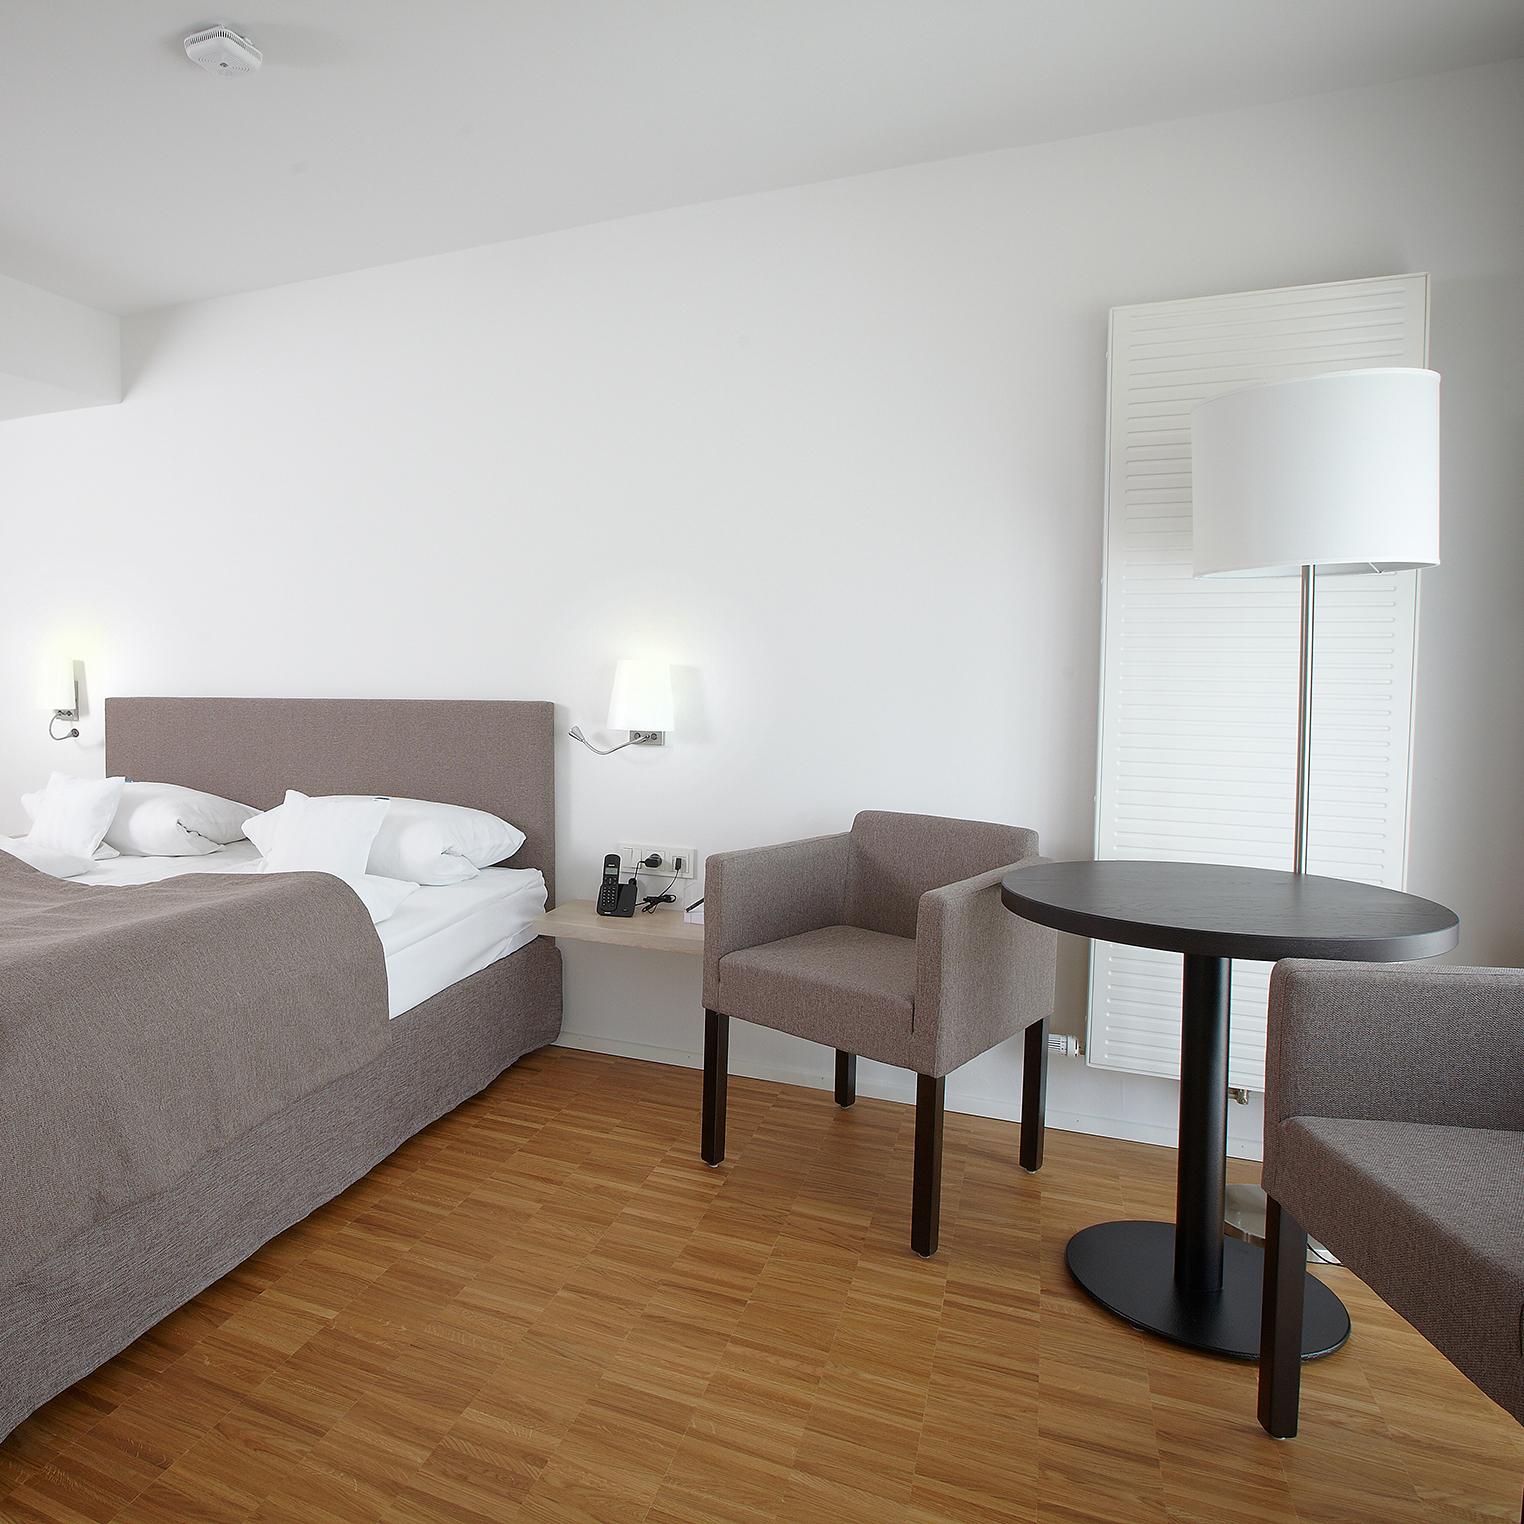 Hotel-Klingelhöffer-270412 1094_web